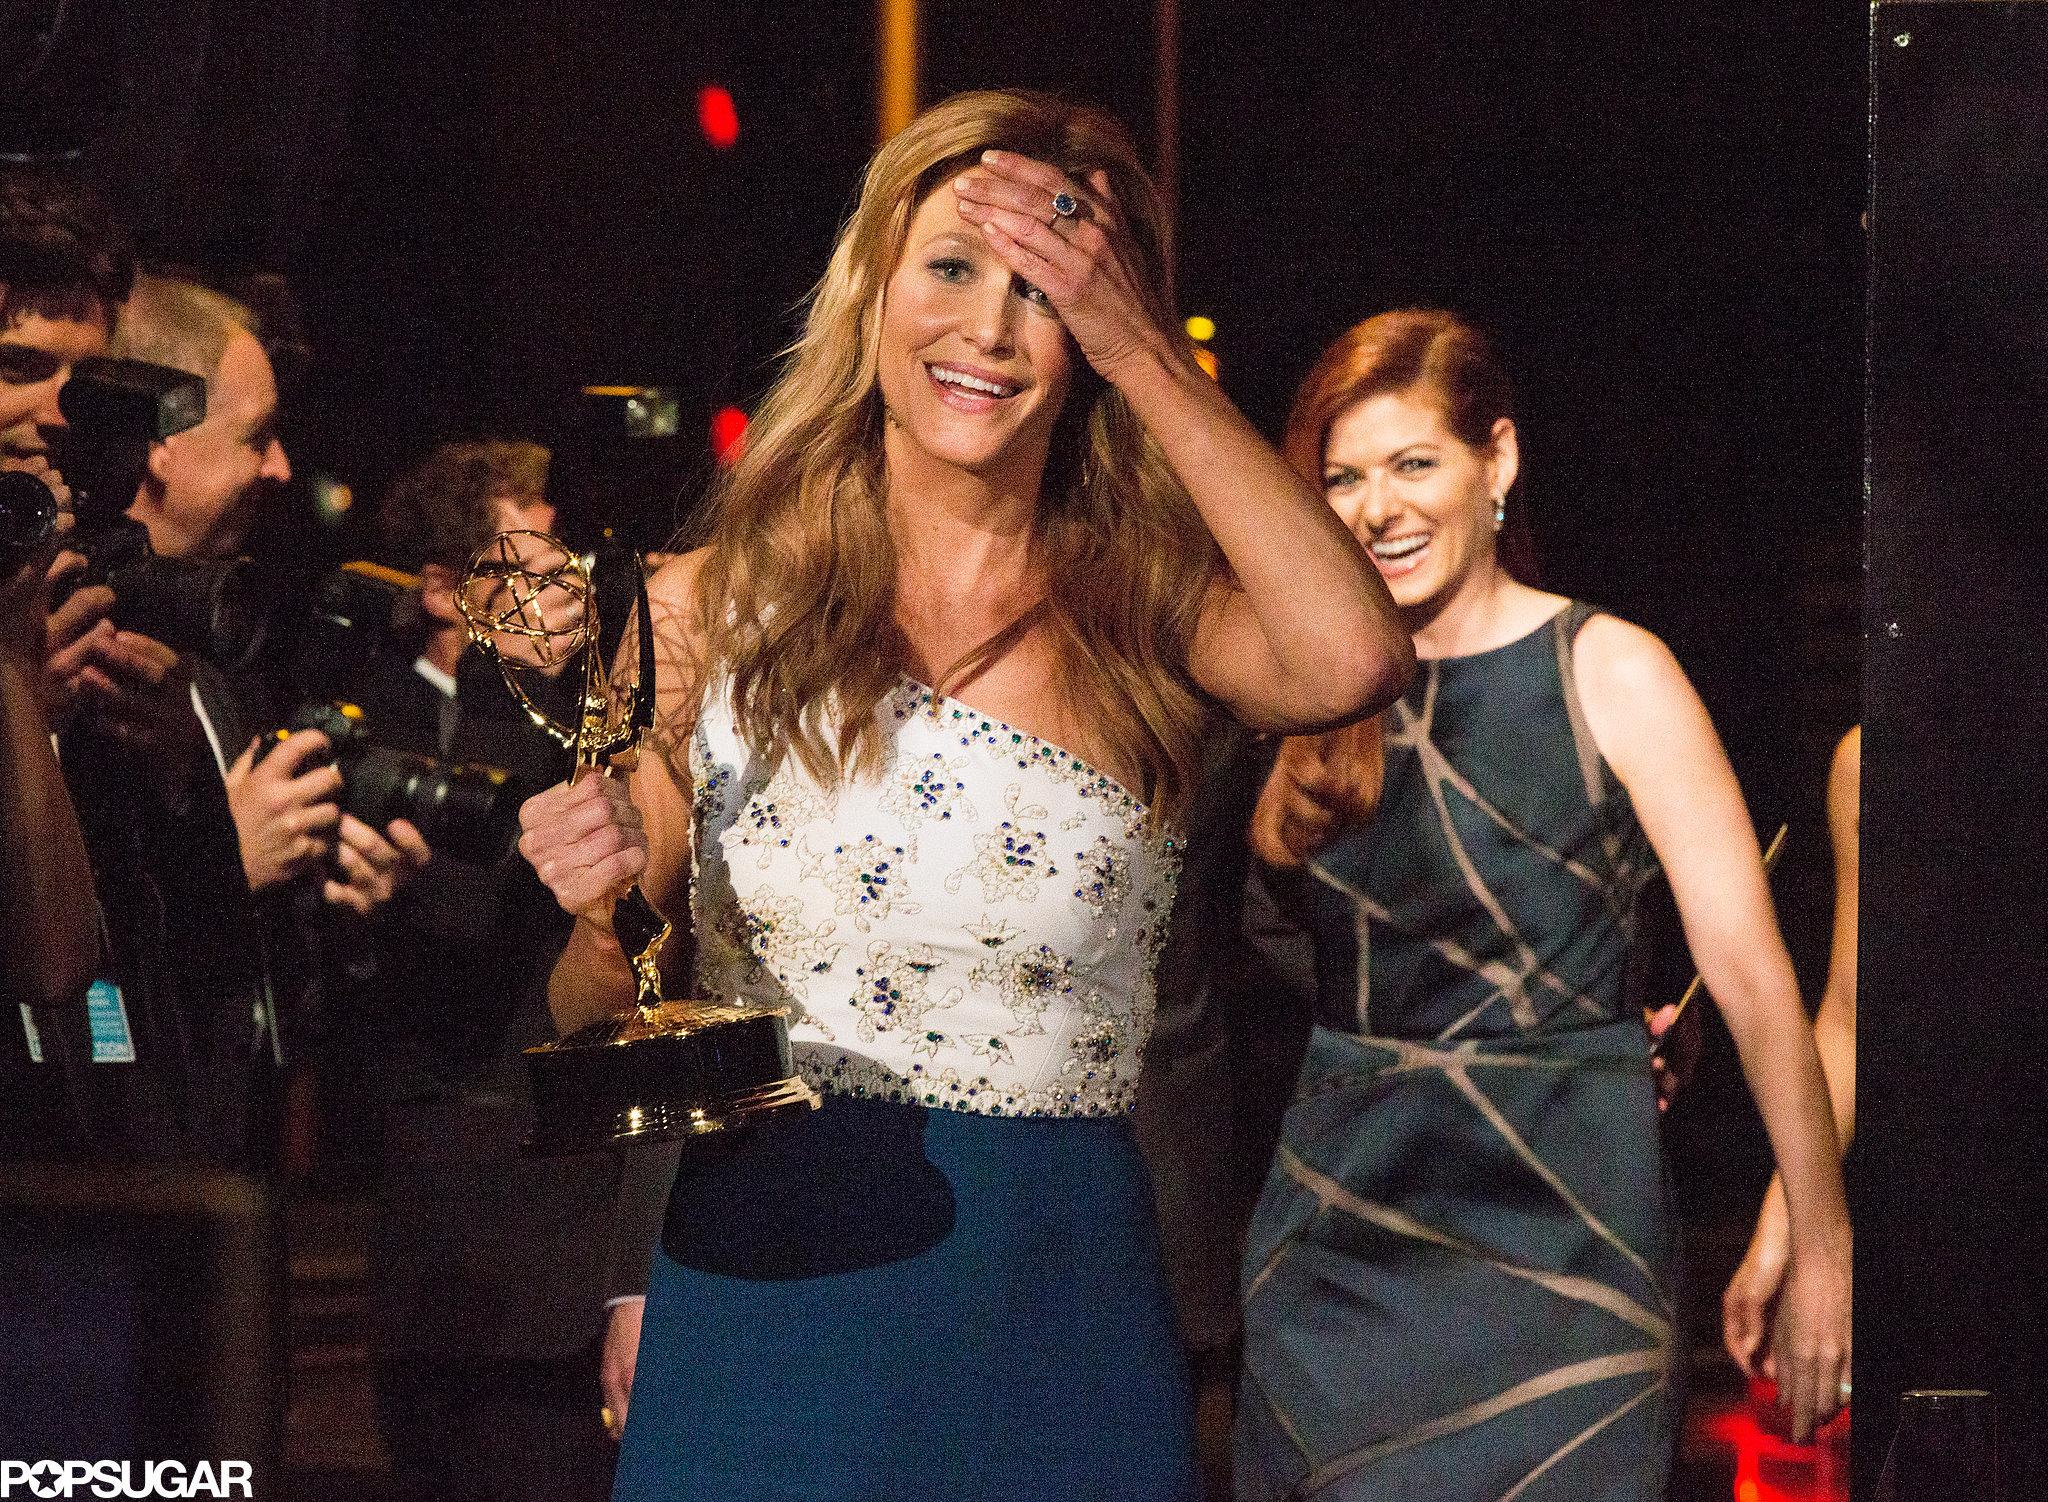 Anna Gunn was overwhelmed backstage.